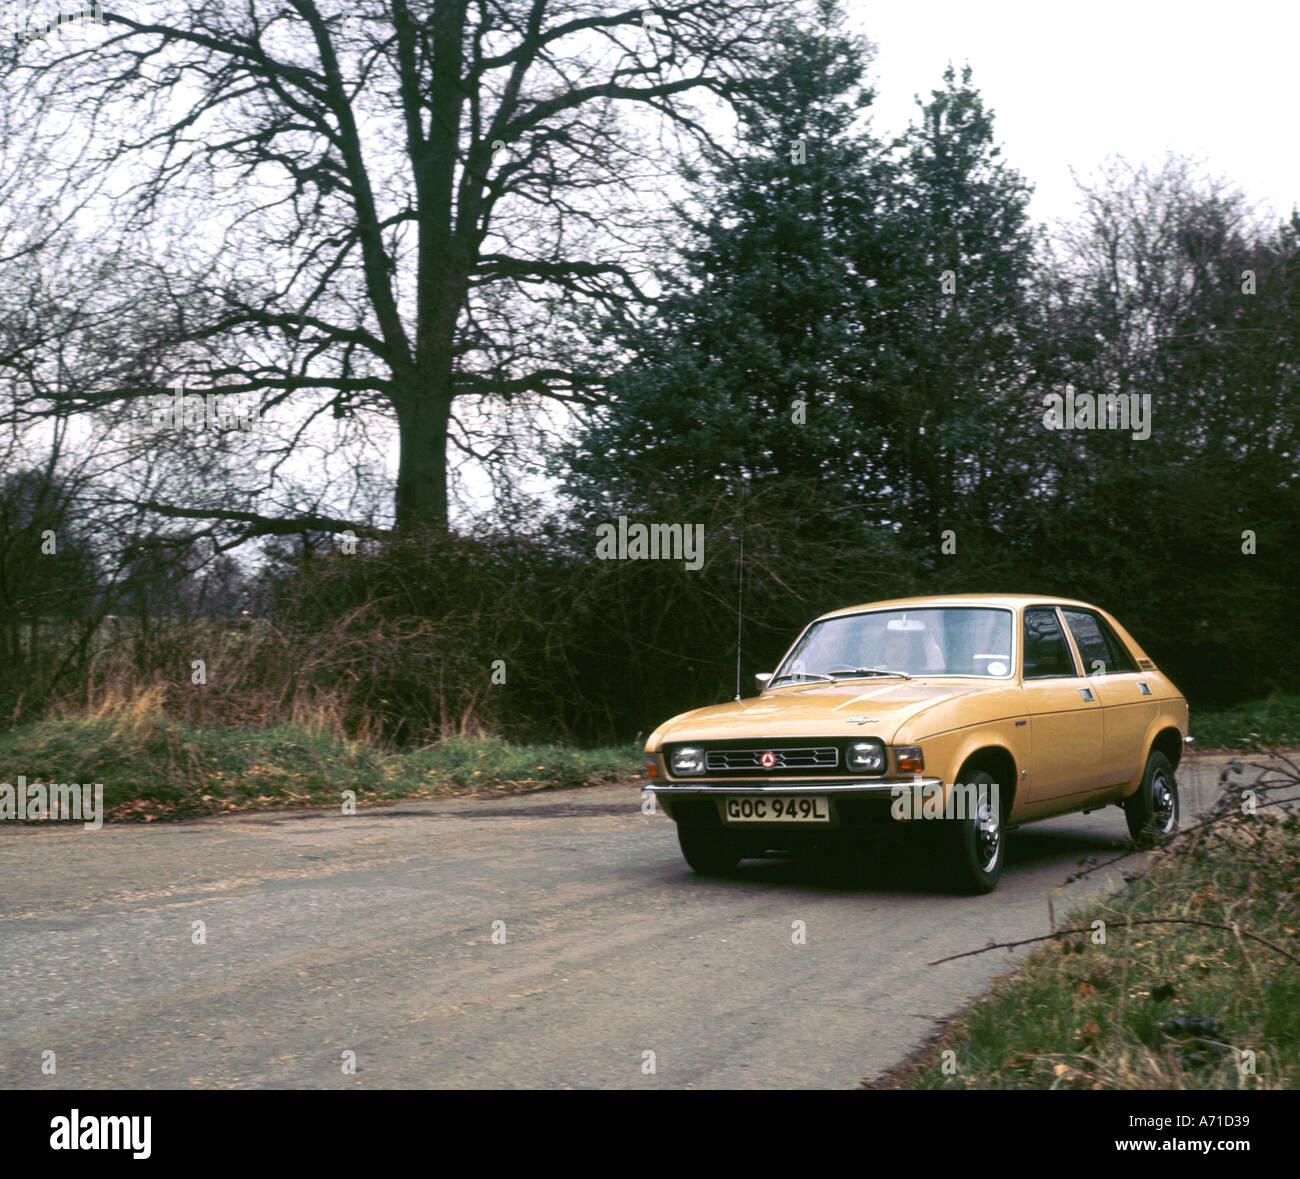 1973 Austin Allegro Immagini Stock